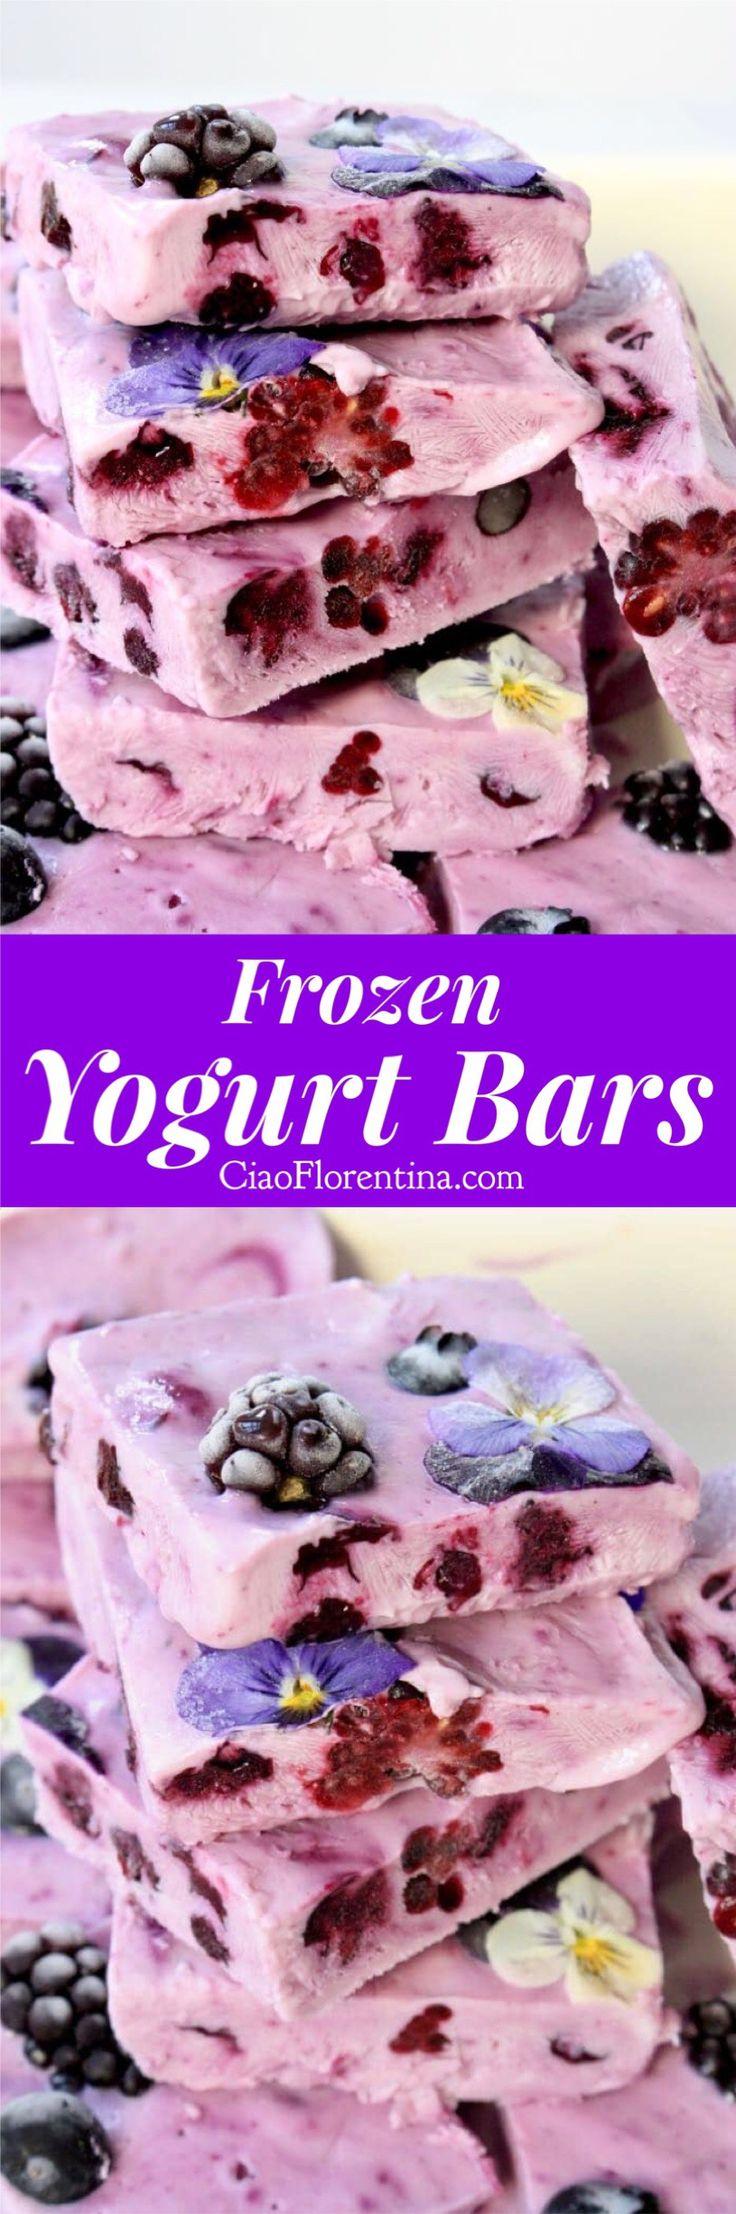 Healthy frozen yogurt bars made with sugar free, non fat creamy Greek yogurt, wild honey and berries | CiaoFlorentina.com @CiaoFlorentina